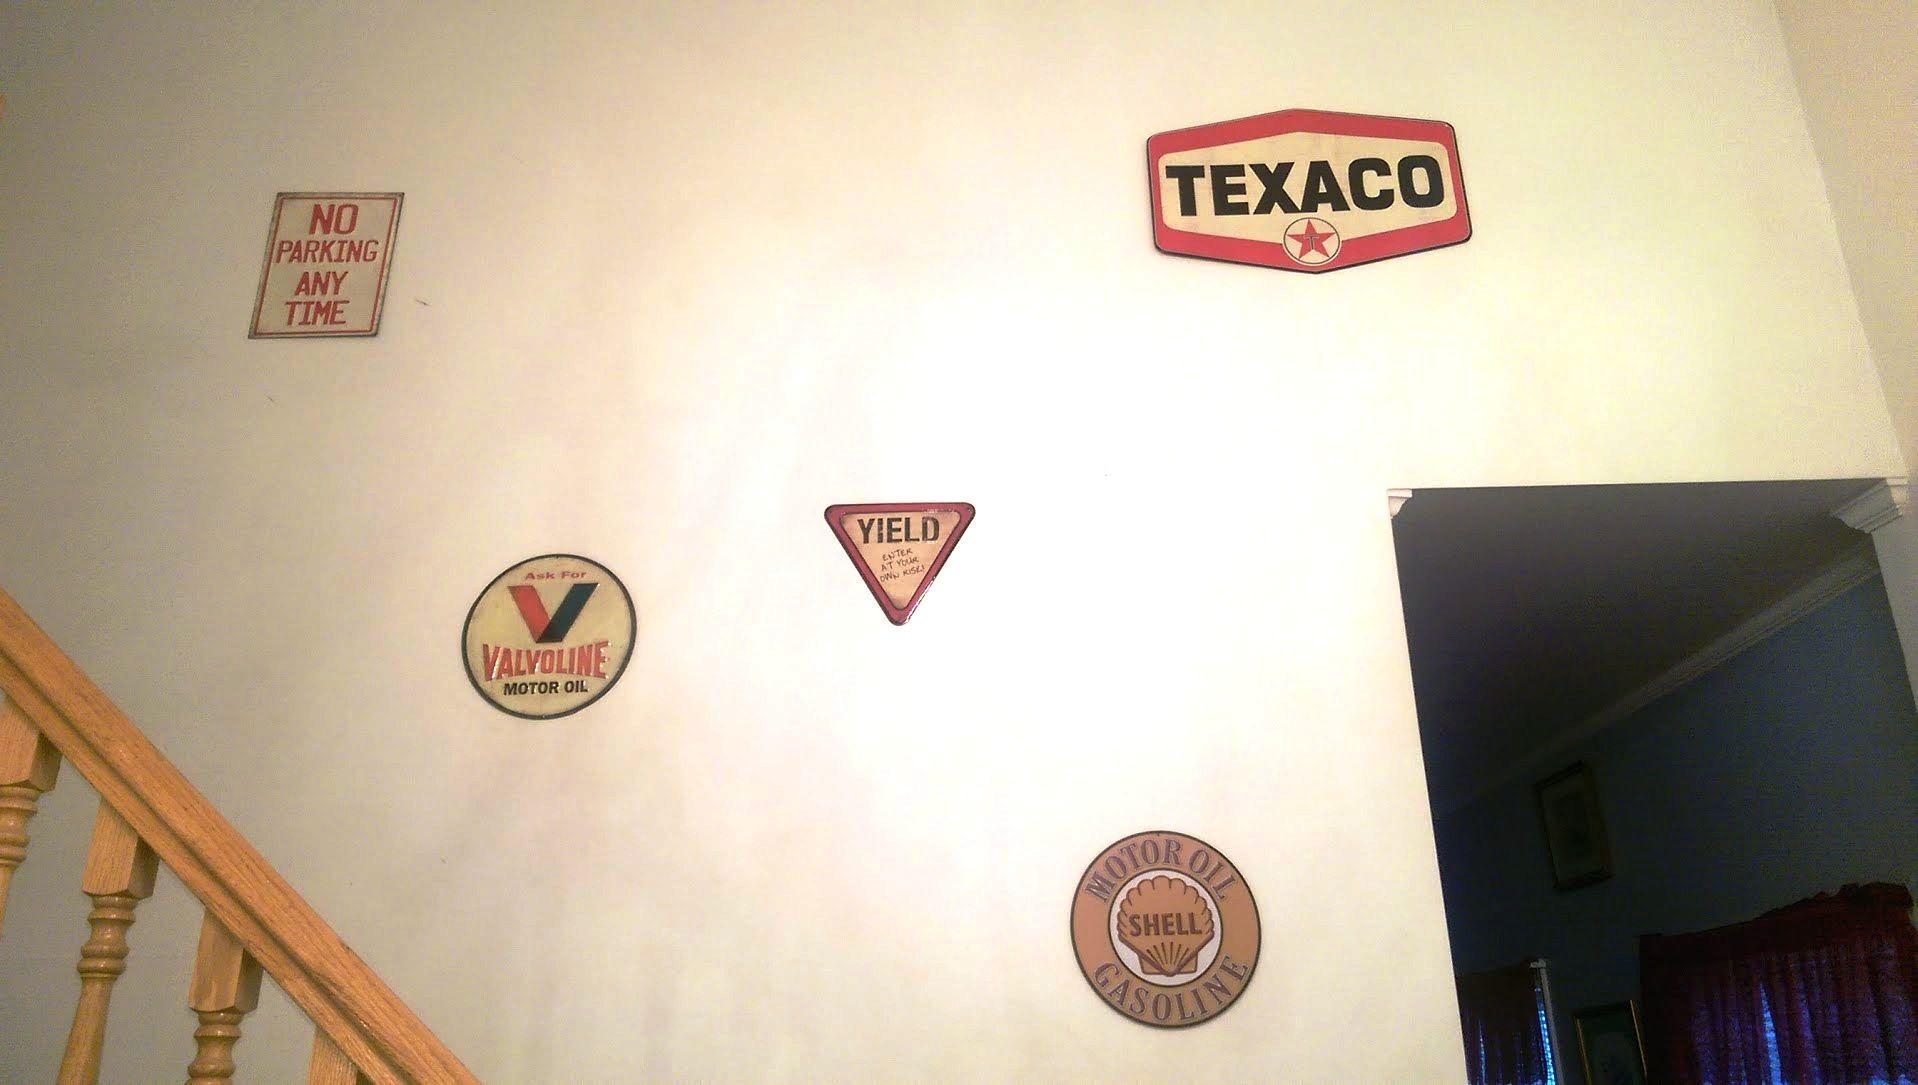 Wall of Metal Signage....brings back memories!